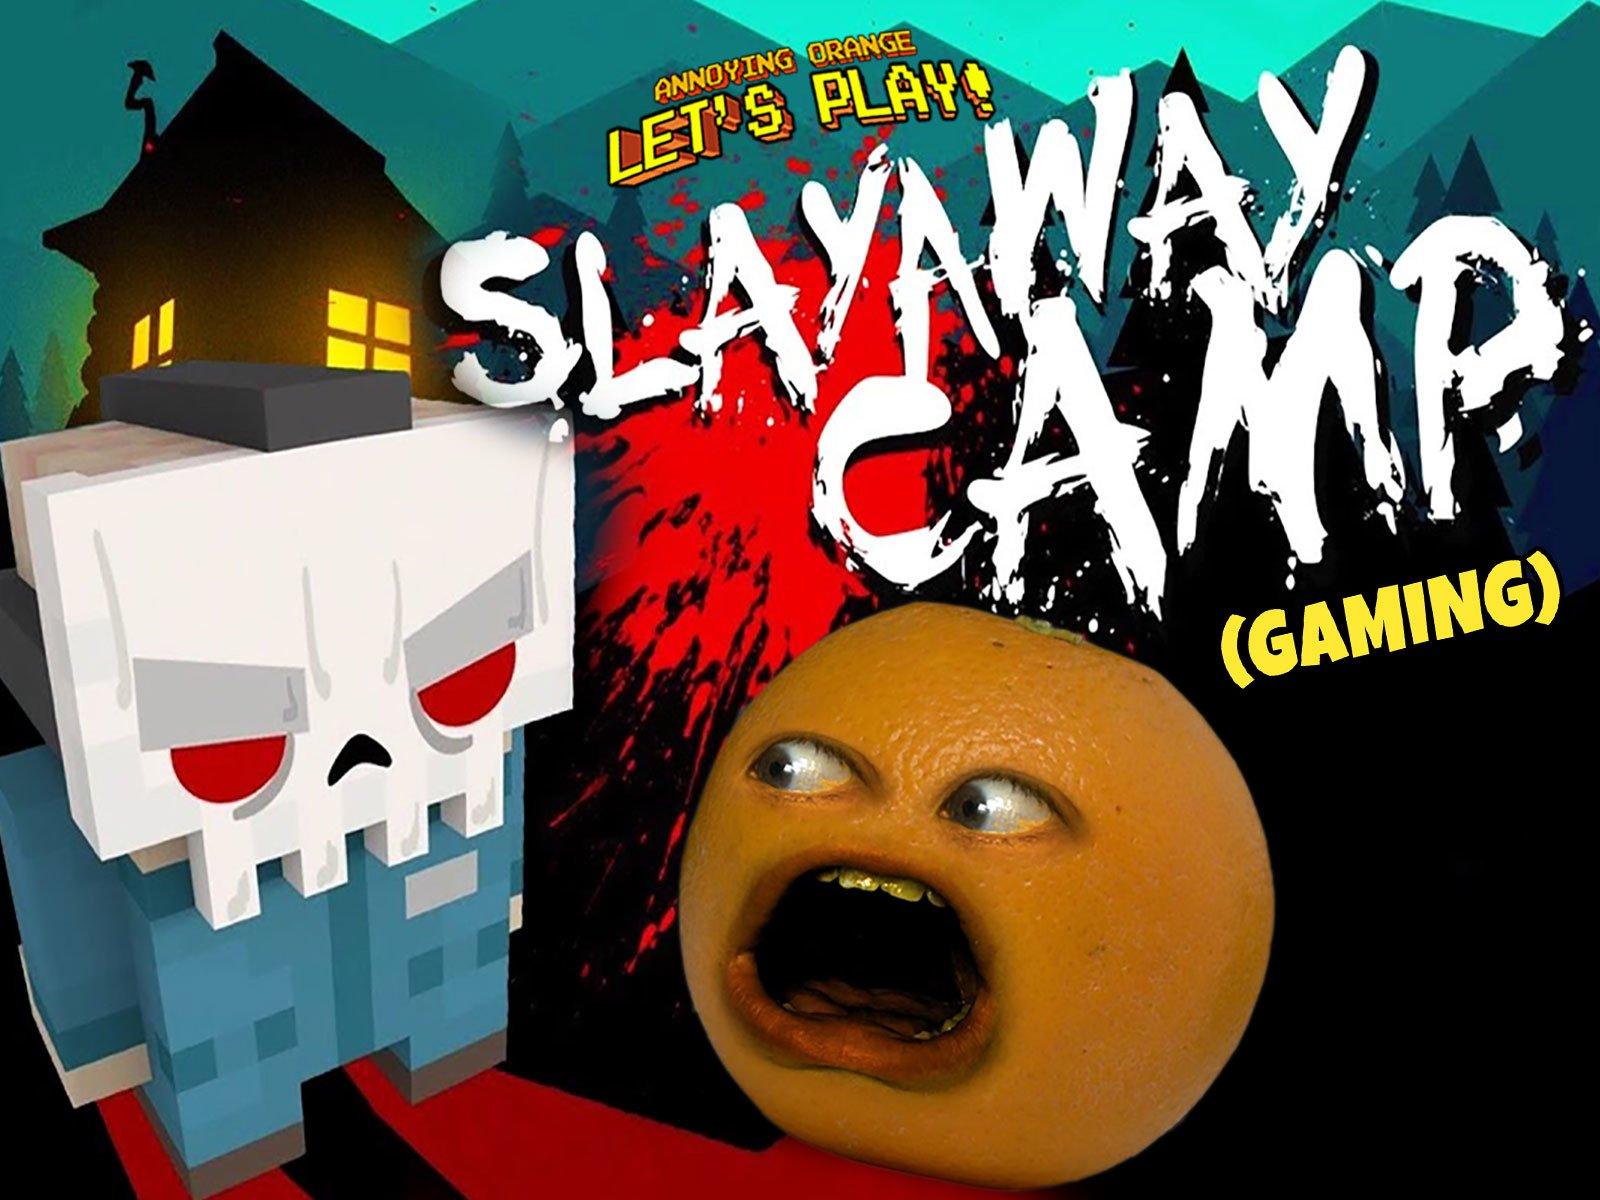 Clip: Annoying Orange Let's Play - Slayaway Camp (Gaming)